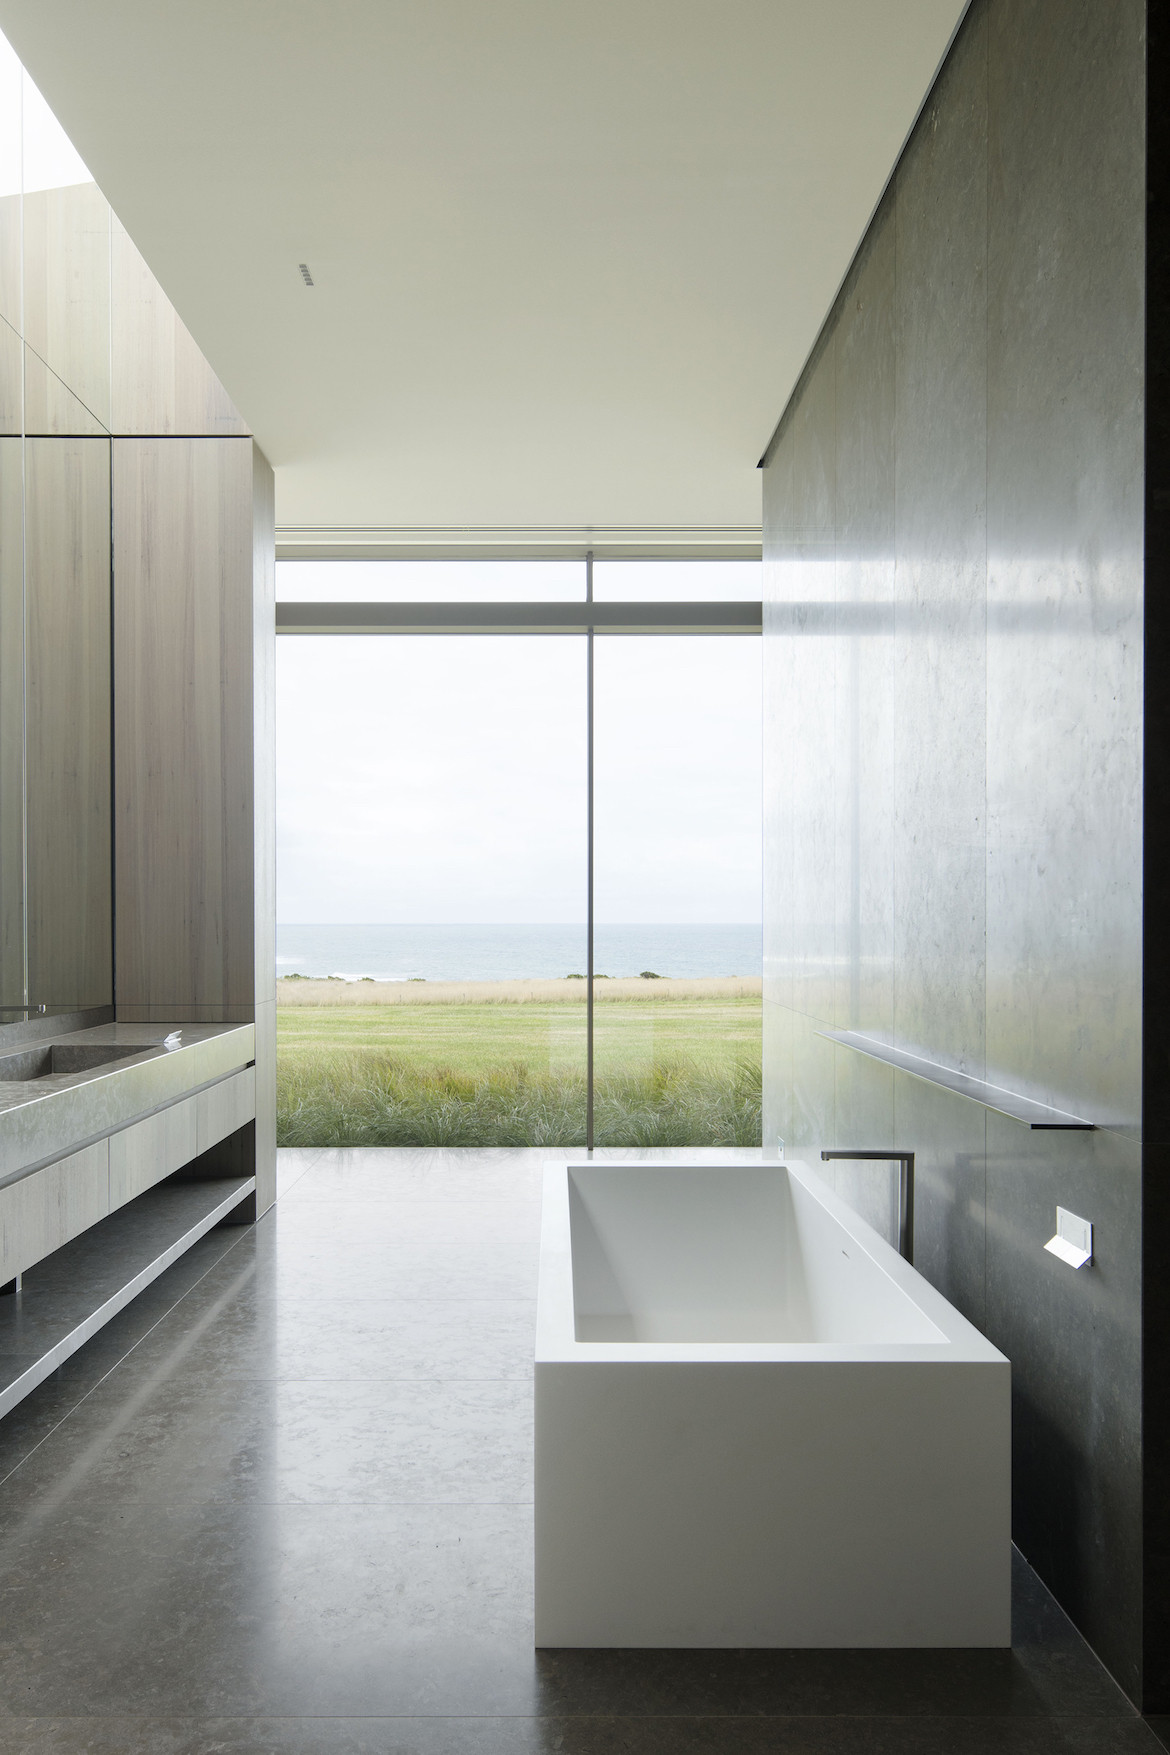 A bathtub looks through the floor-to-ceiling windows over the ocean views.